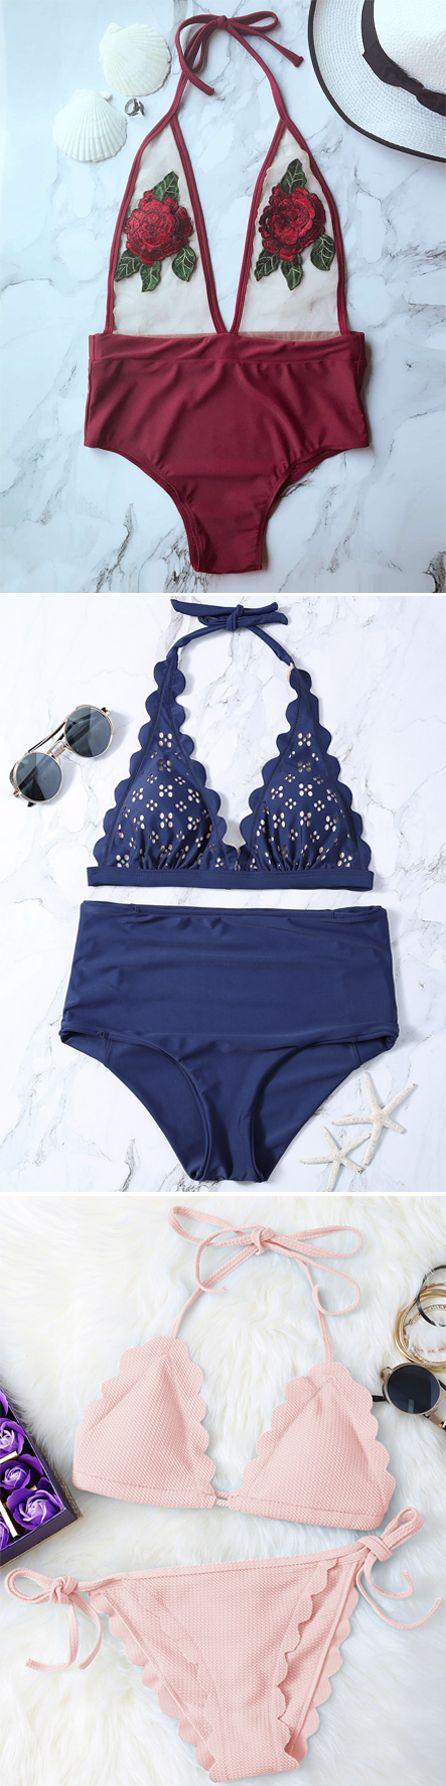 Swimwear in Zaful  swimsuits,bathing suit,bikini,bikini set,one pieces,swimwear 2017,beach outfit,bikinis,beach,beach wear,Hawaii,summer bikinis   #Bikini